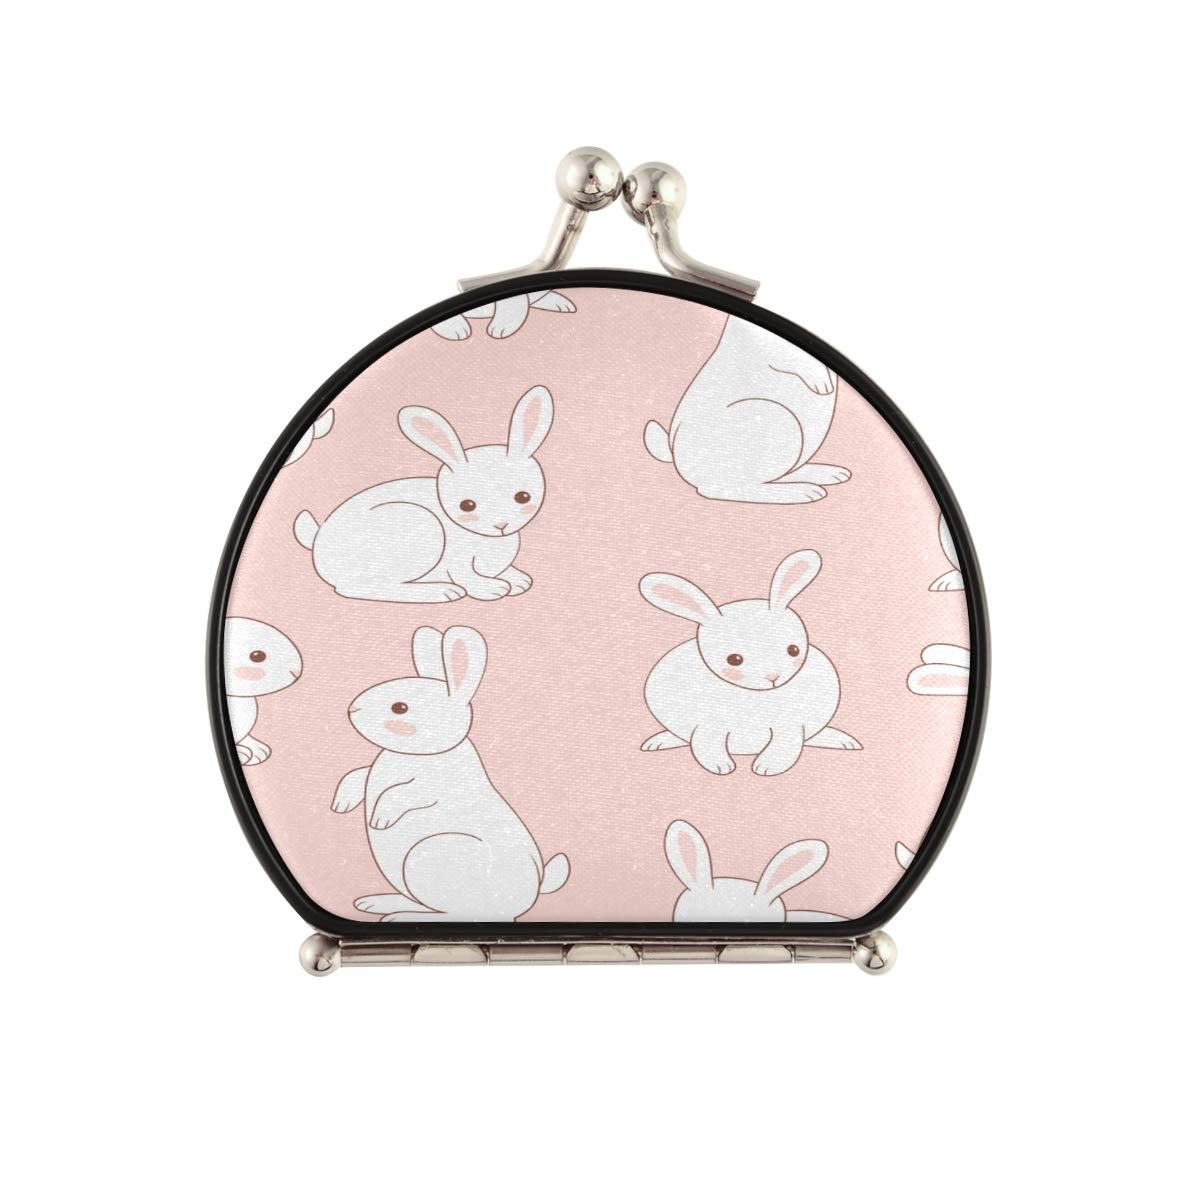 DoubleSidedMakeupMirror White Funny Cute Pet Ranking TOP5 High quality Rabbit Co Animal